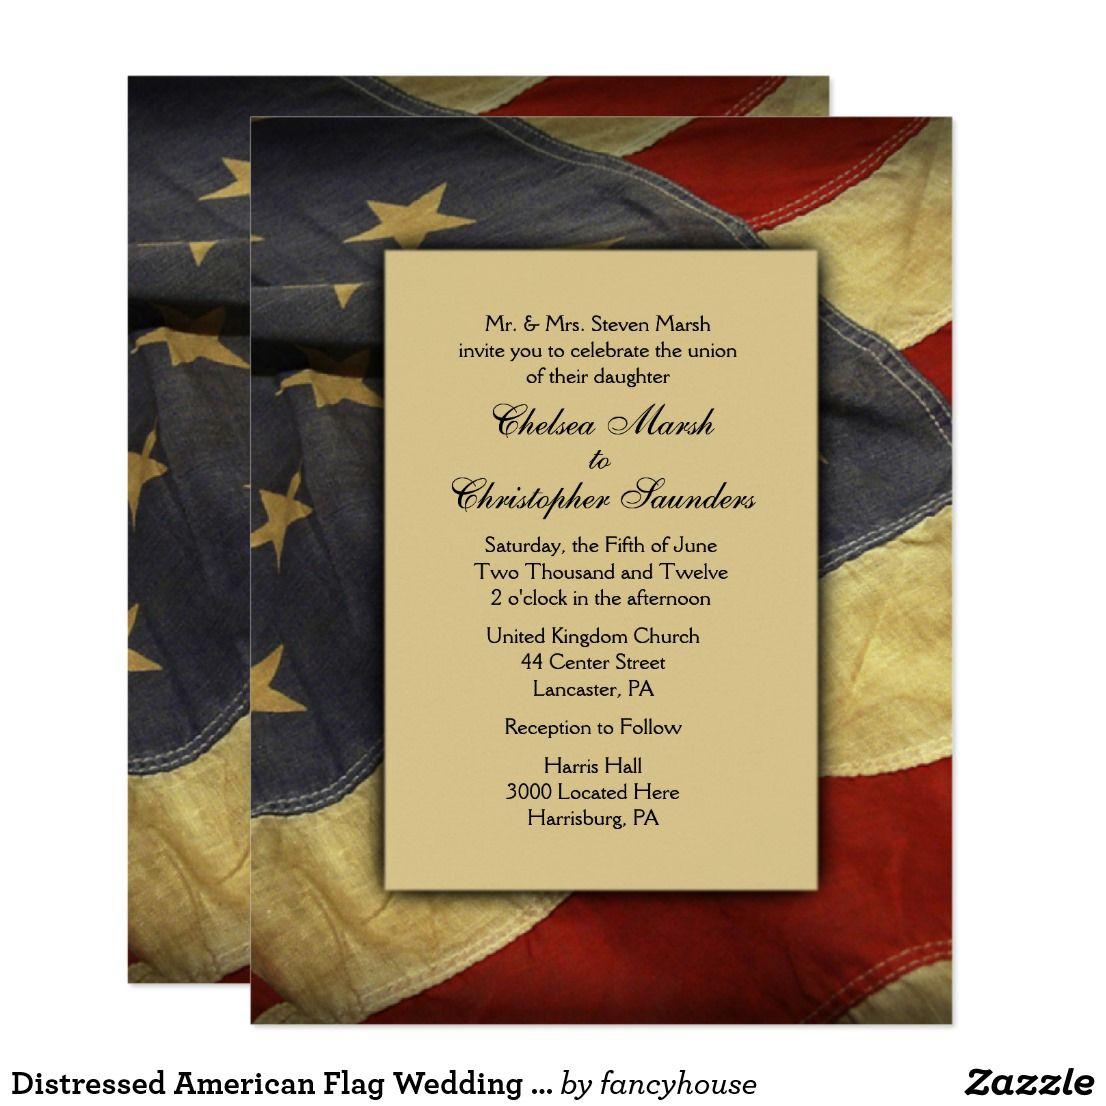 Distressed American Flag Wedding Invitations | ~Zazzle Wedding ...